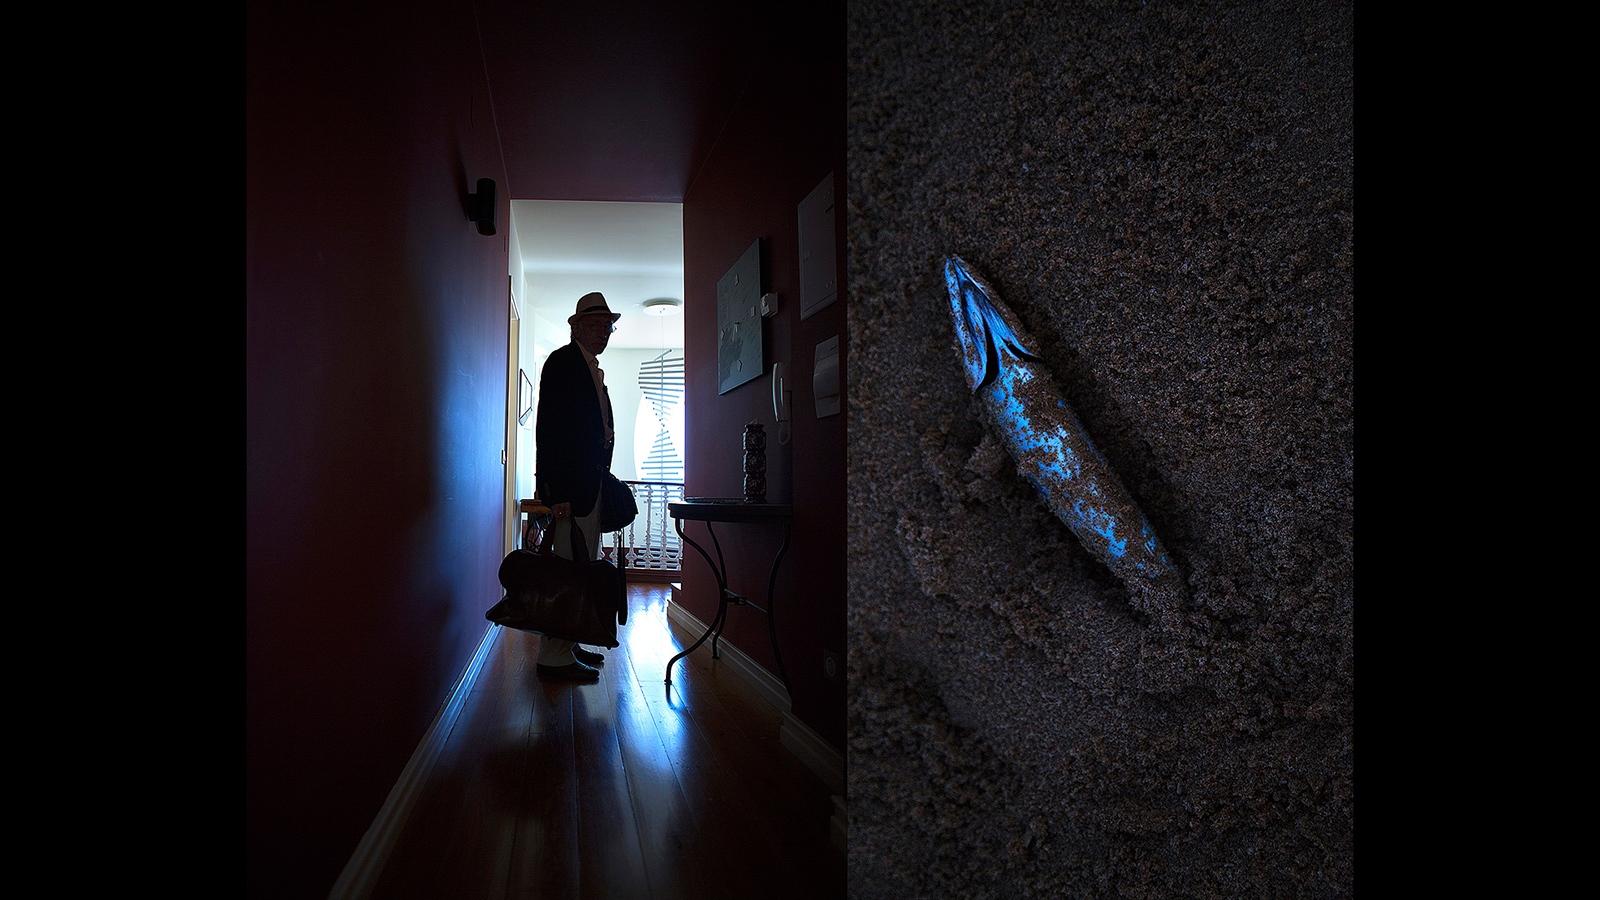 Art and Documentary Photography - Loading __TheresaOrtolani_05.jpg